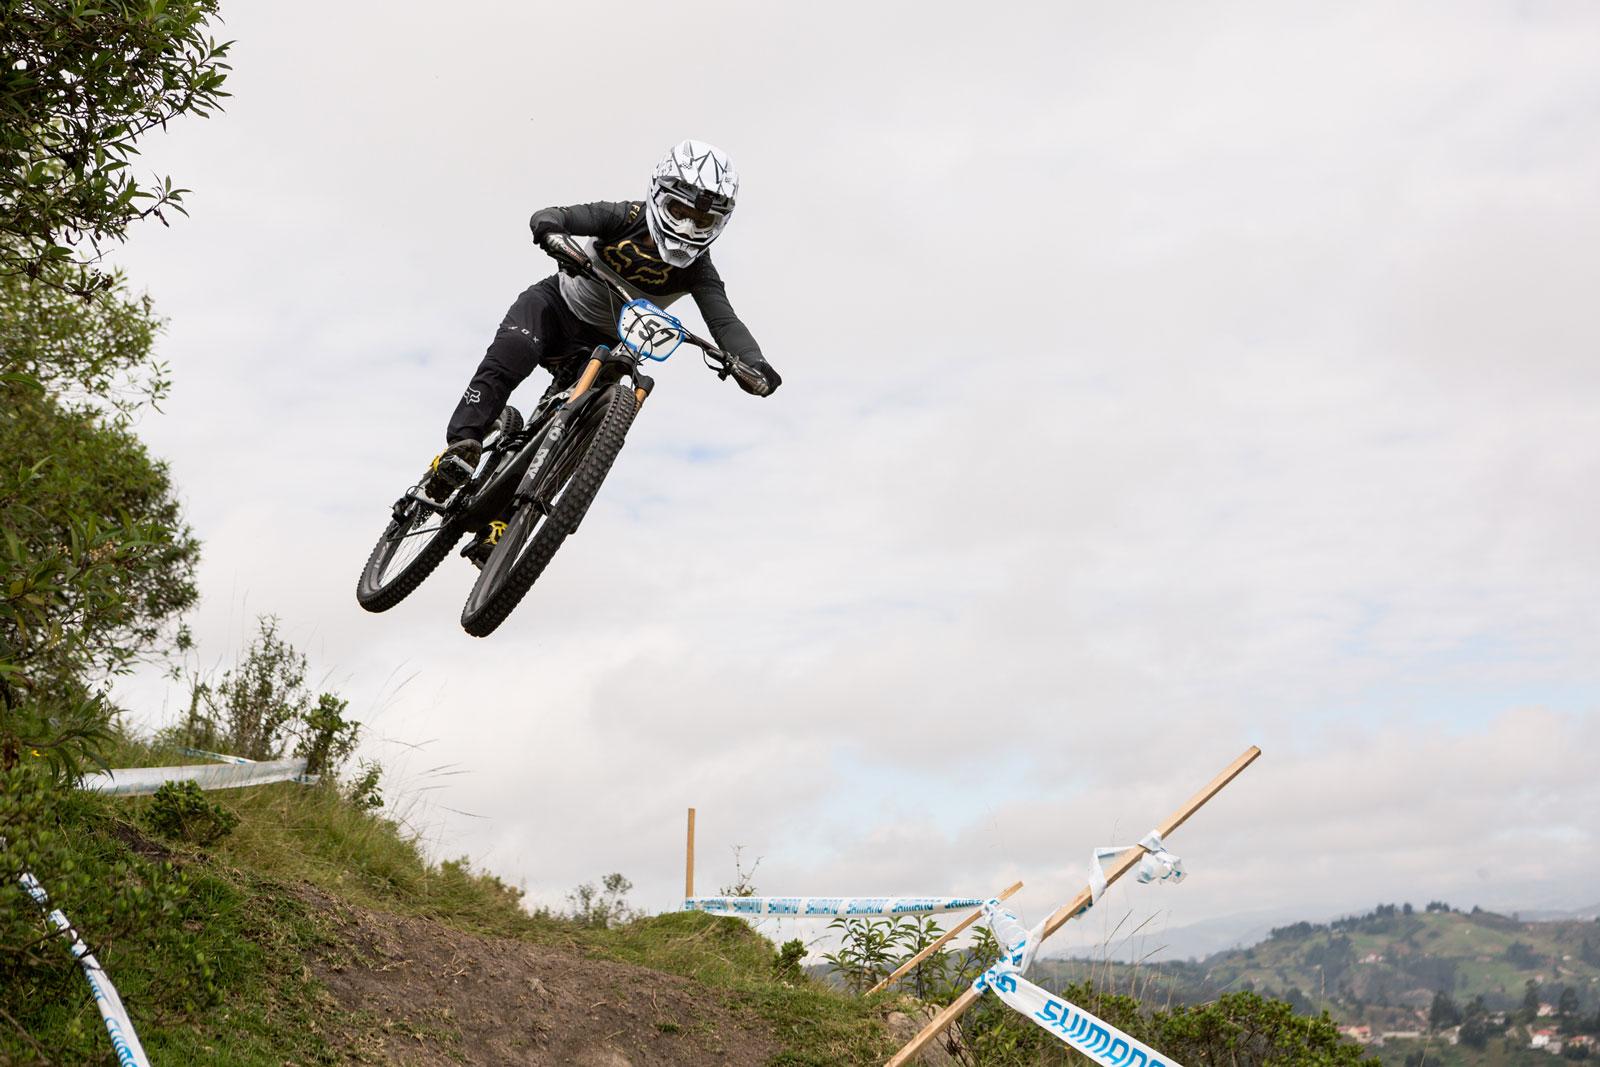 Rider_FRANCISCO-LLERENA_PH_AleJaneta